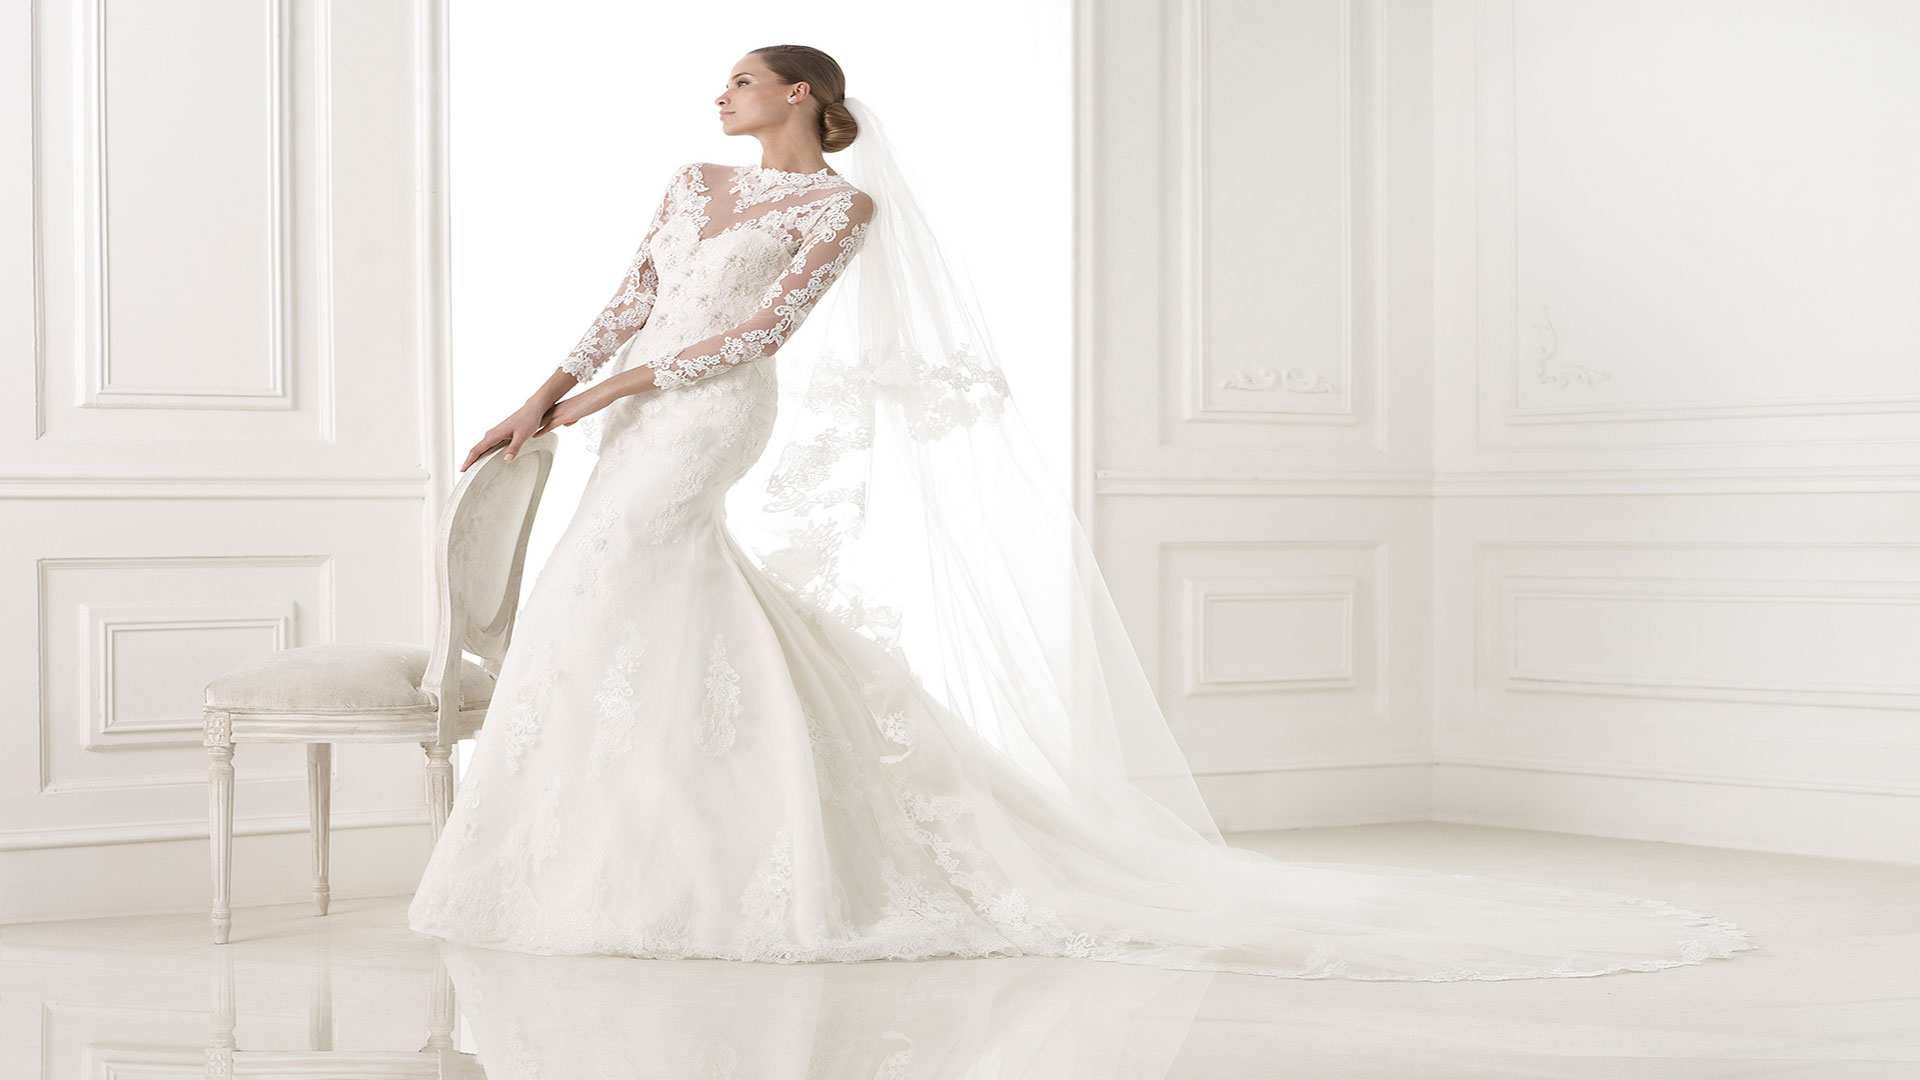 805795792c6446b4ad870ed7f07b4012 - نکات مهمی که باید برای مدل آرایش عروس خود در نظر بگیرید